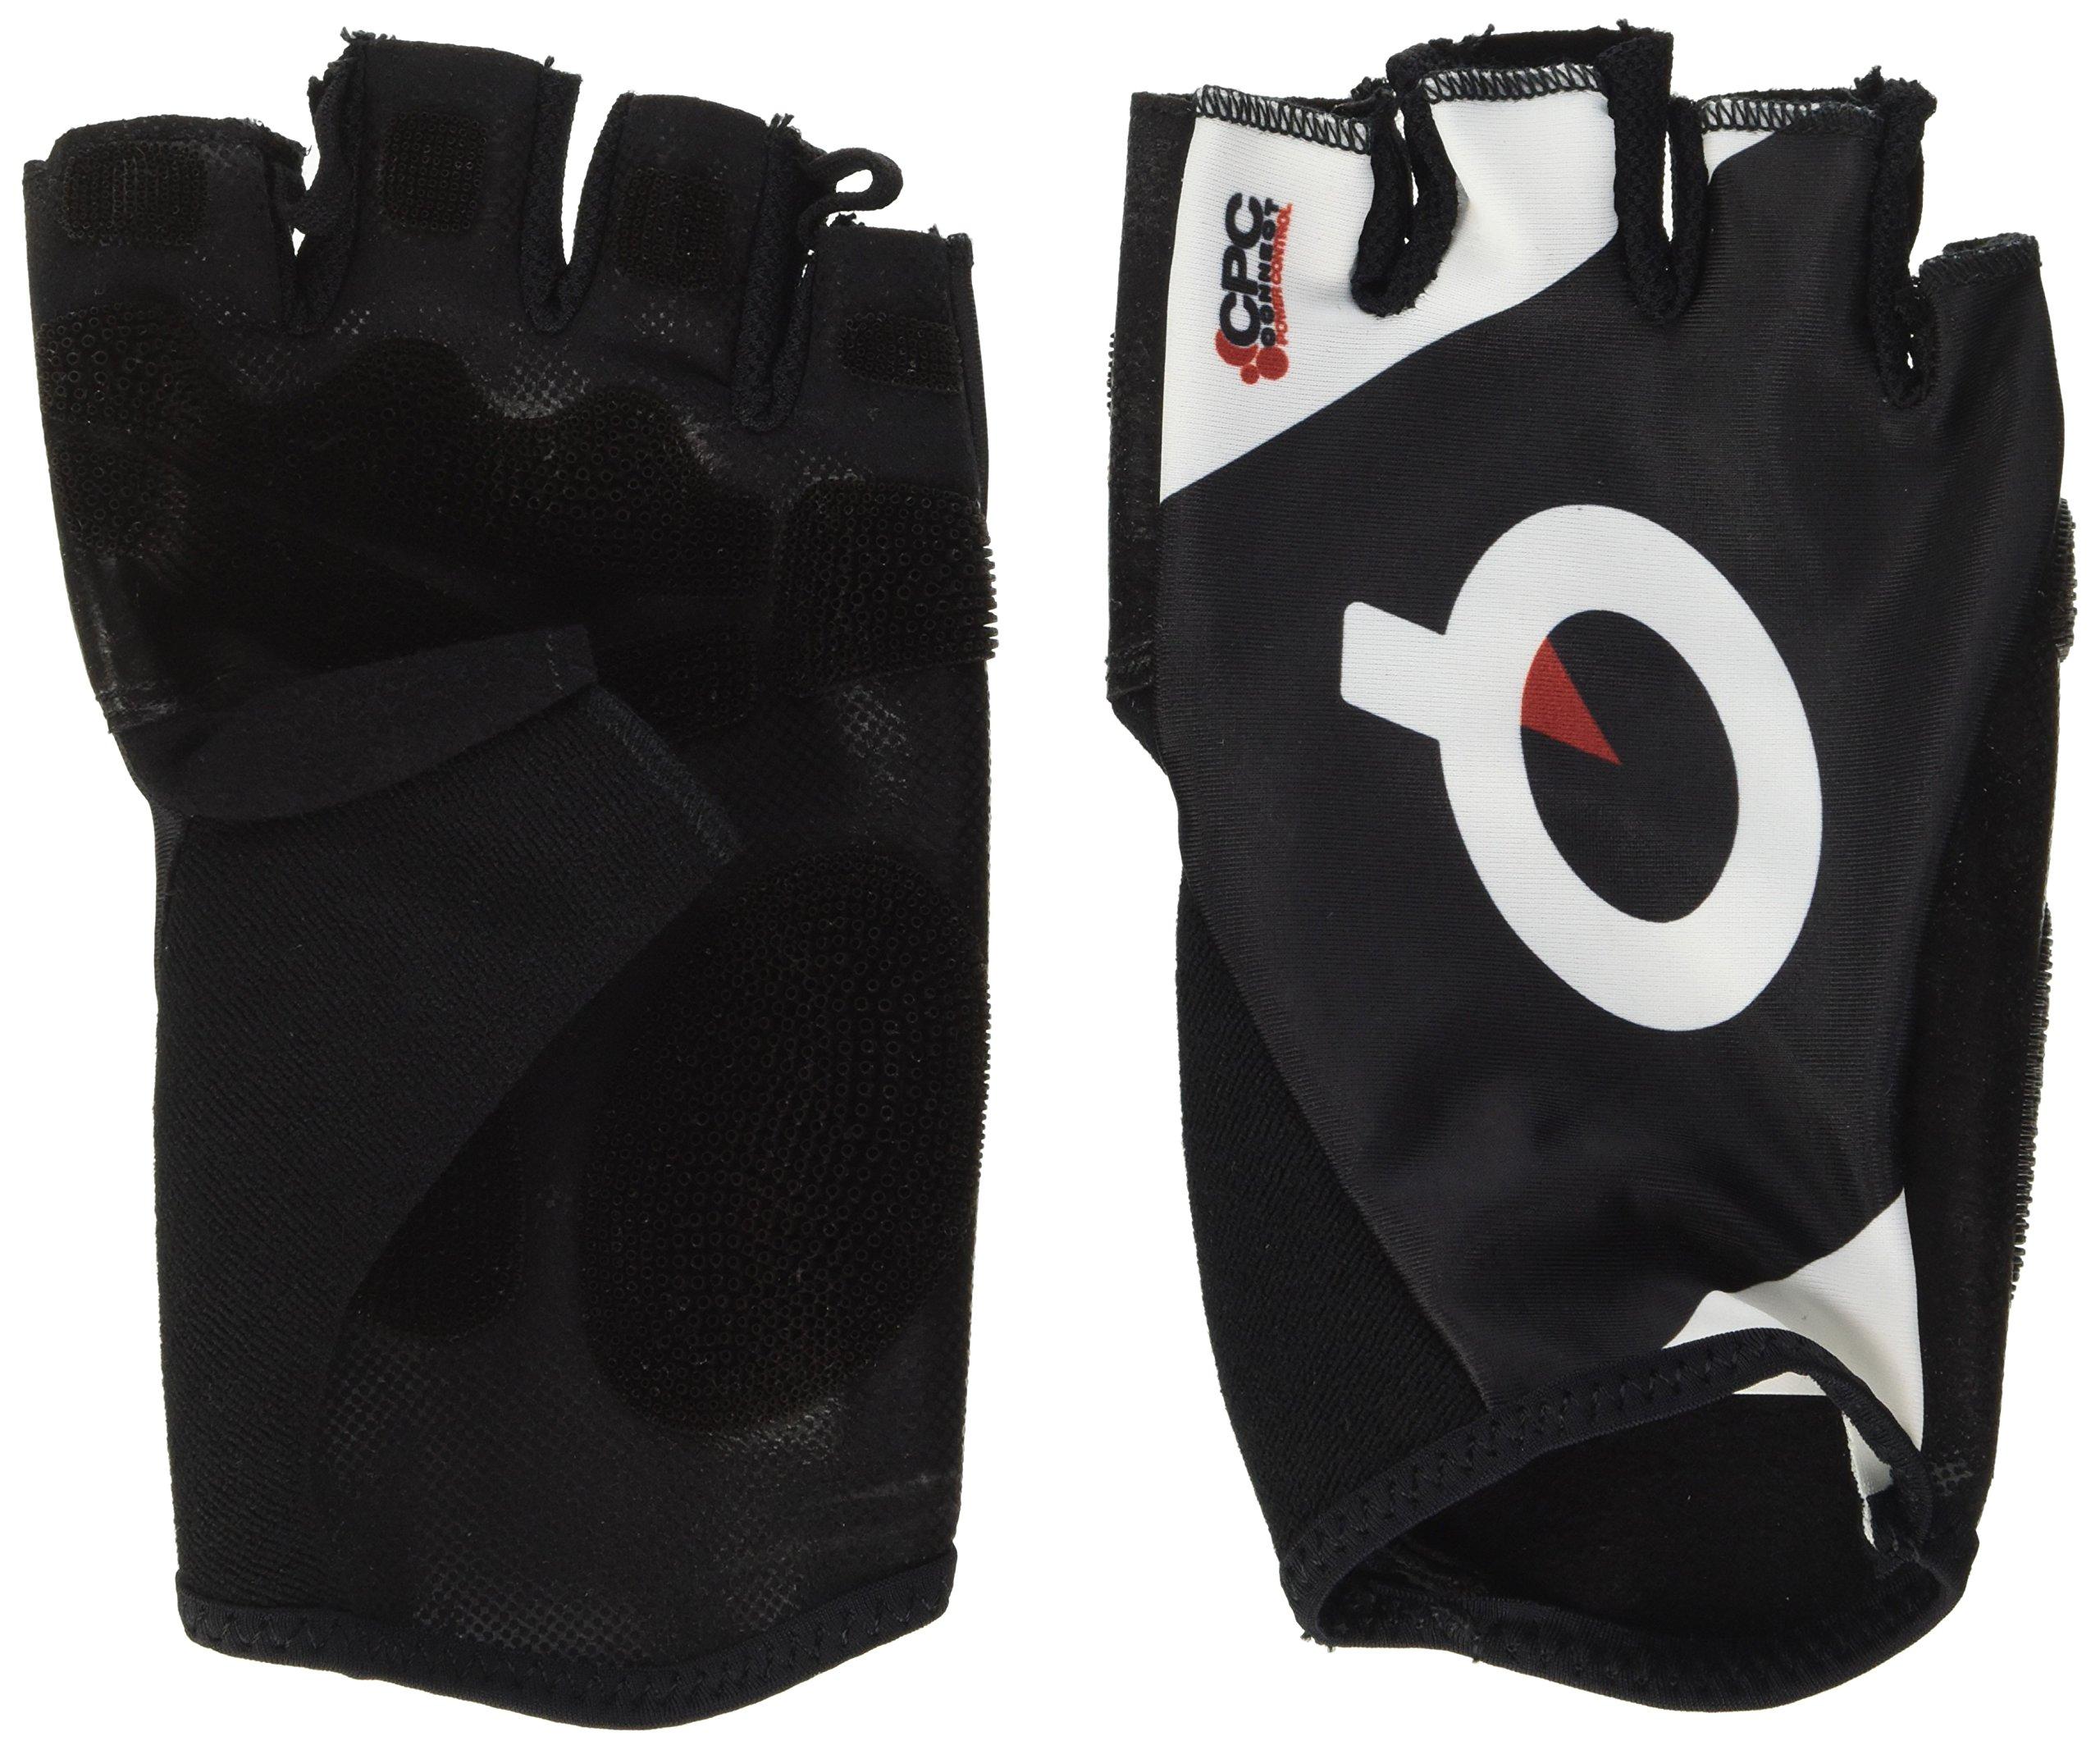 Prologo CPC Glove Short Finger: Black Euro SM